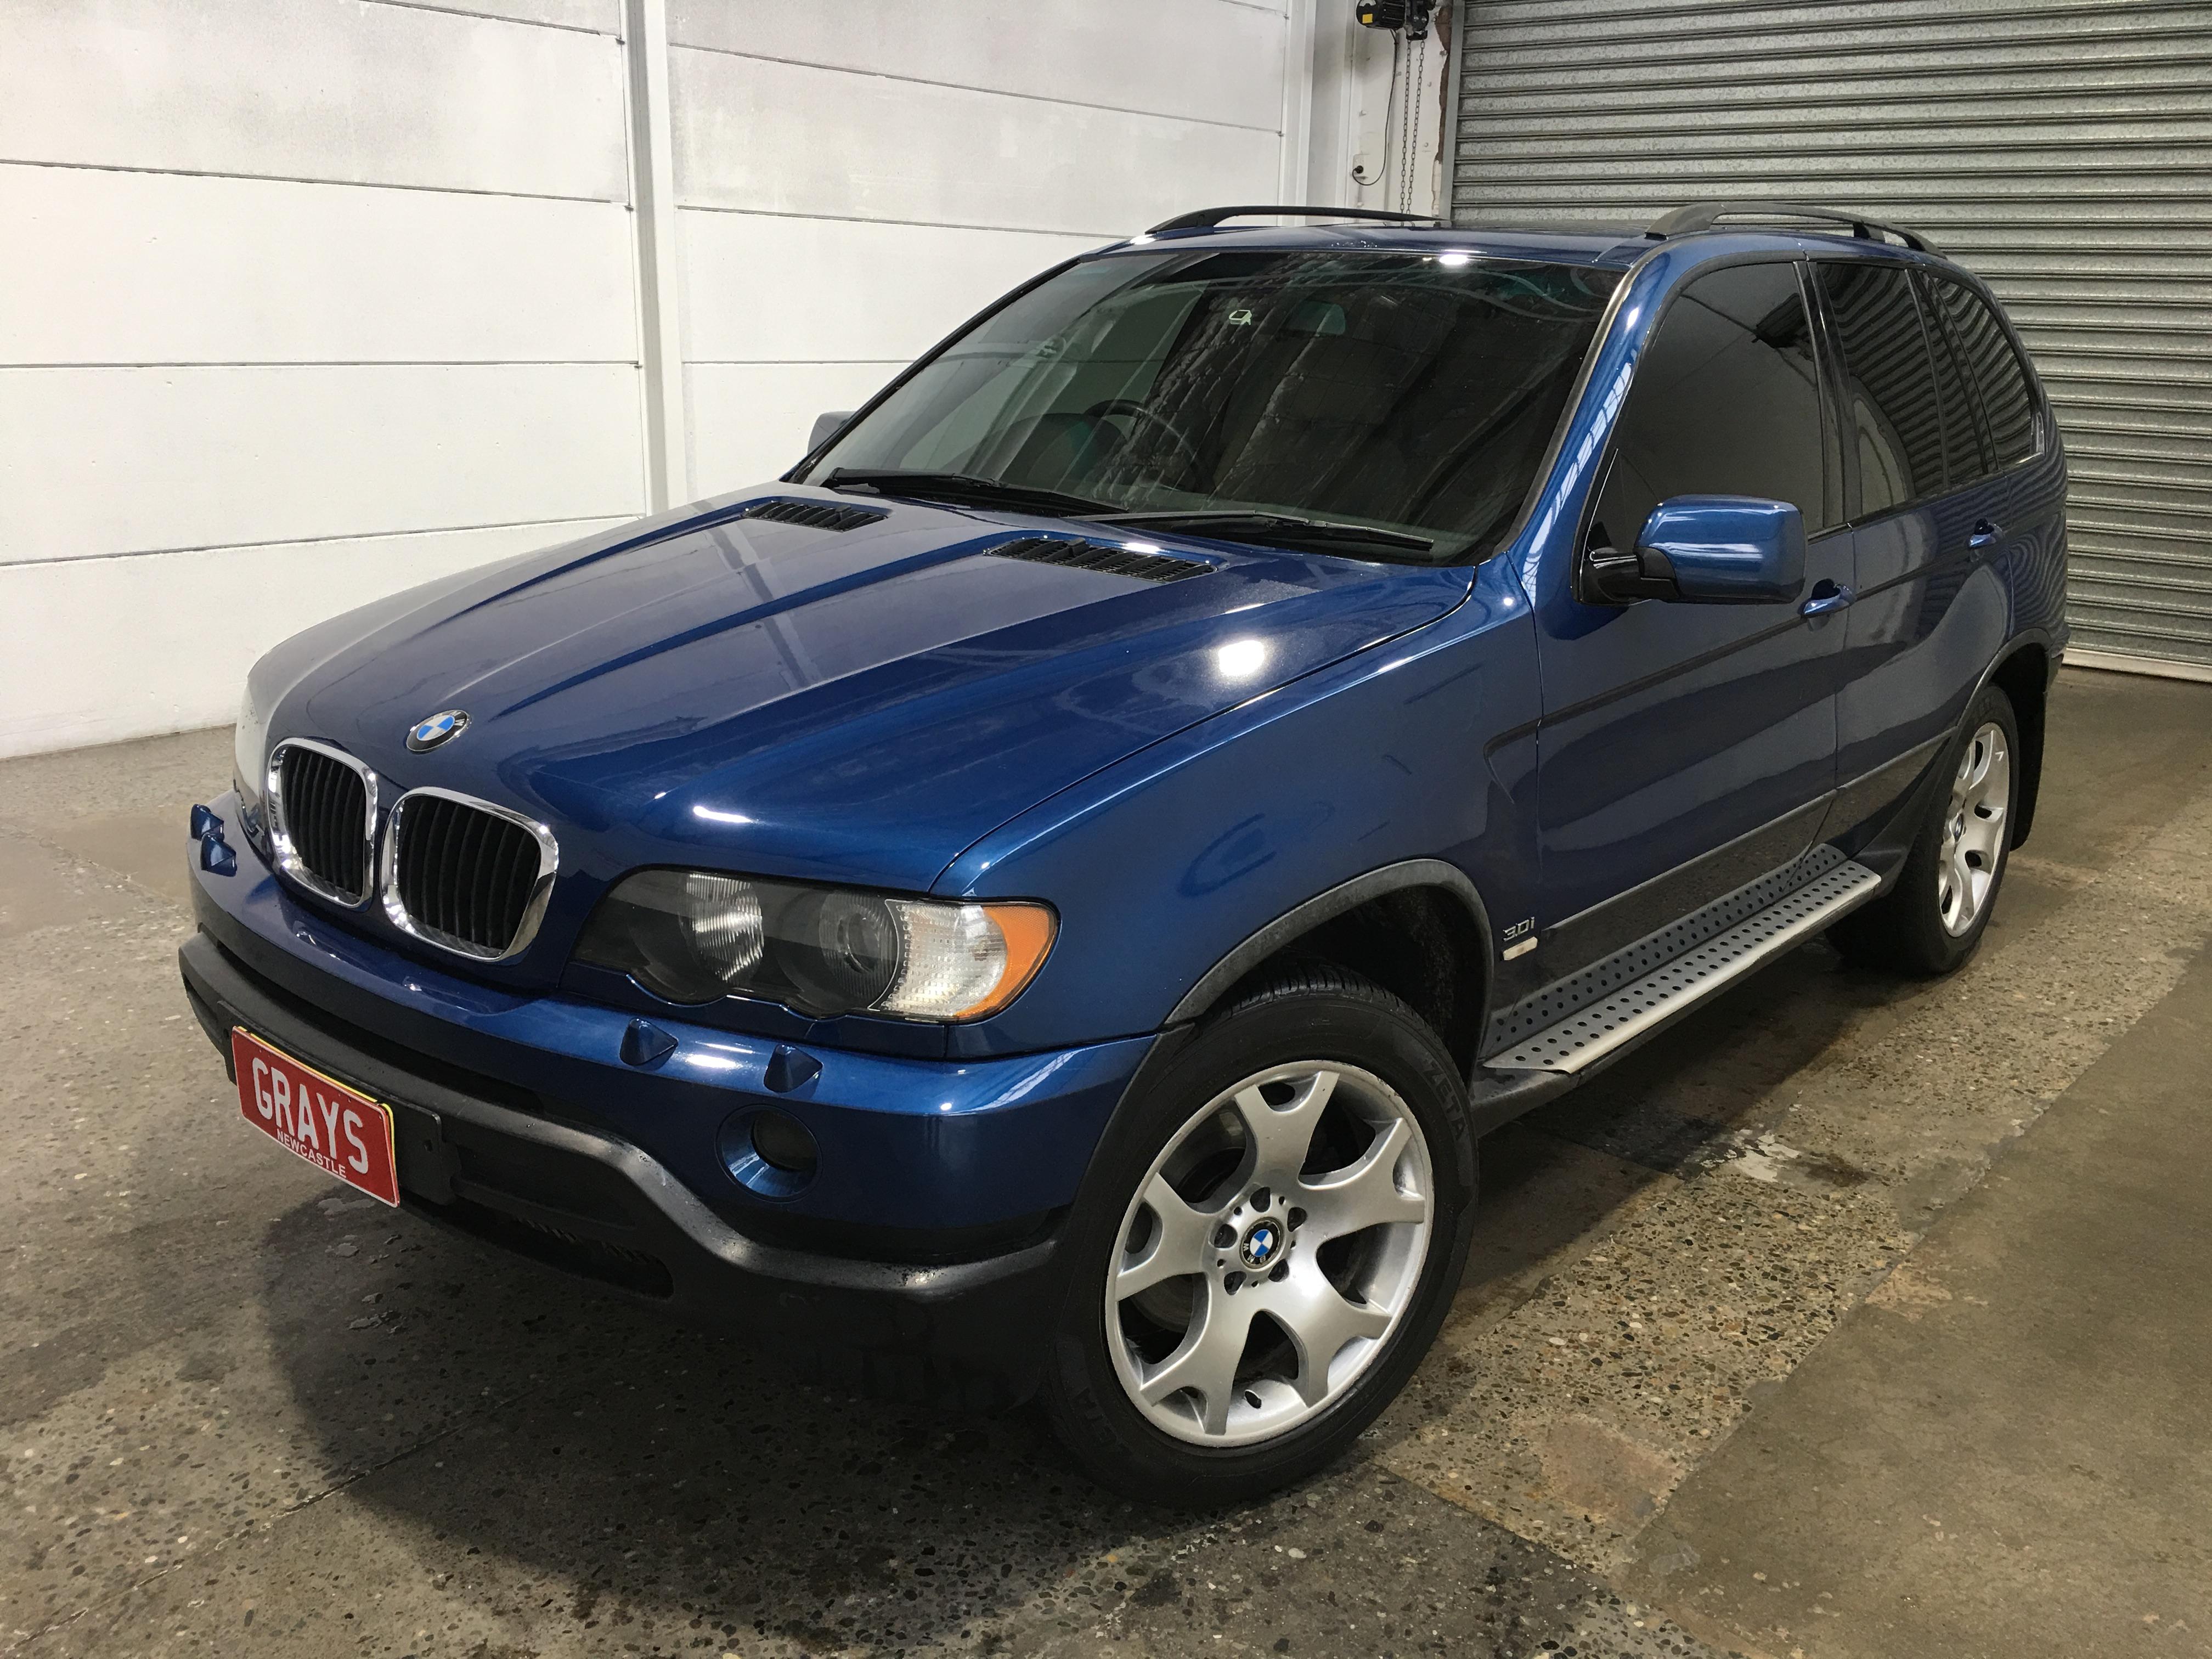 2001 BMW X5 3.0i E53 Automatic Wagon